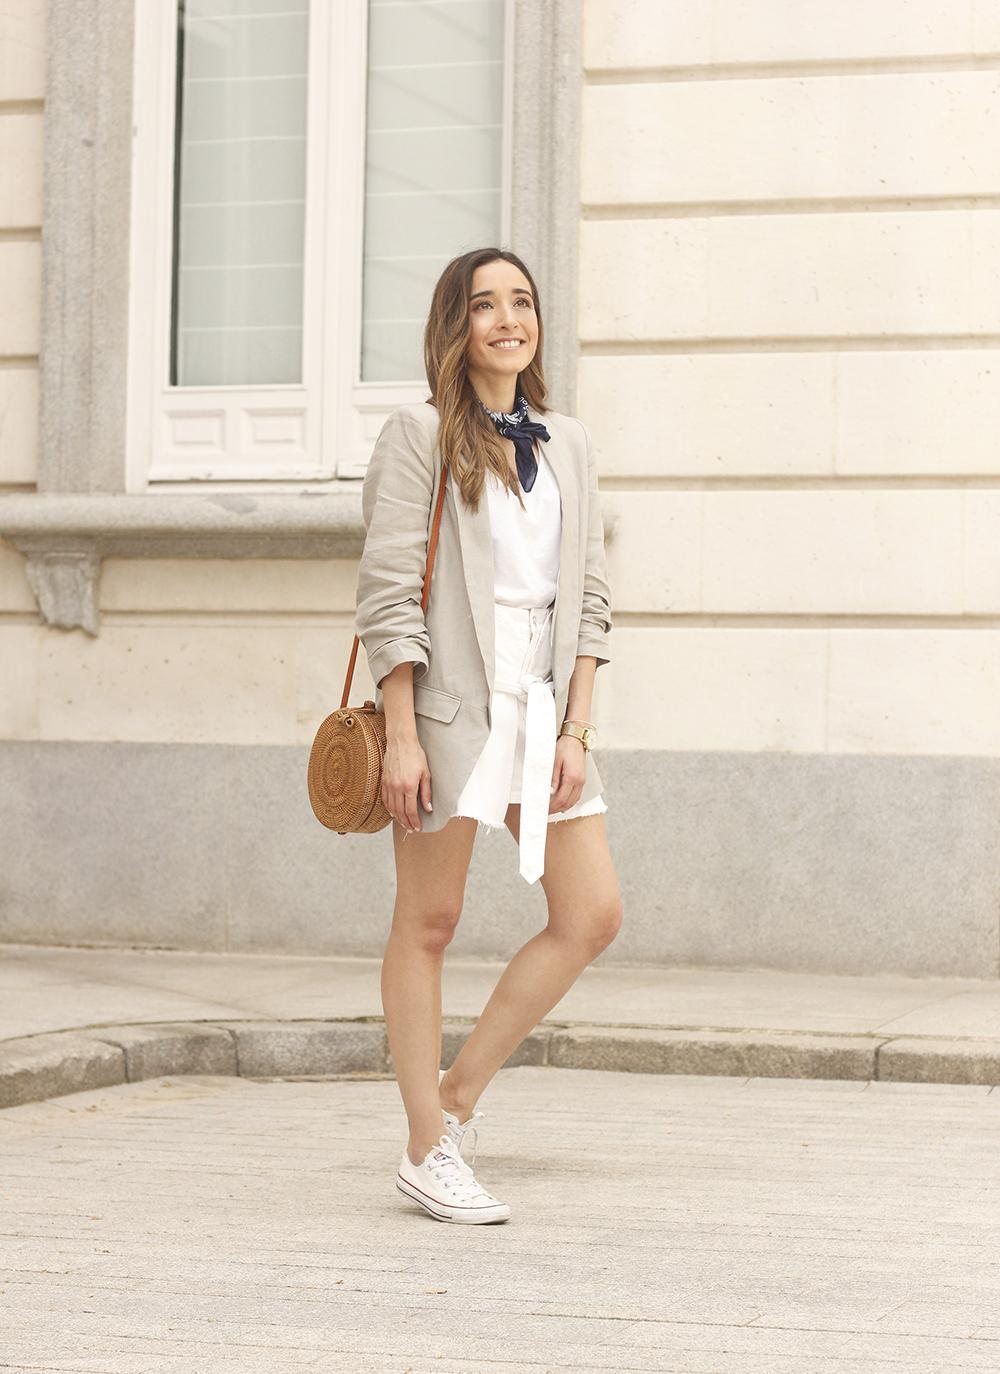 gray linen blazer blue bandana white converse bamboo bag street style oufit 201805